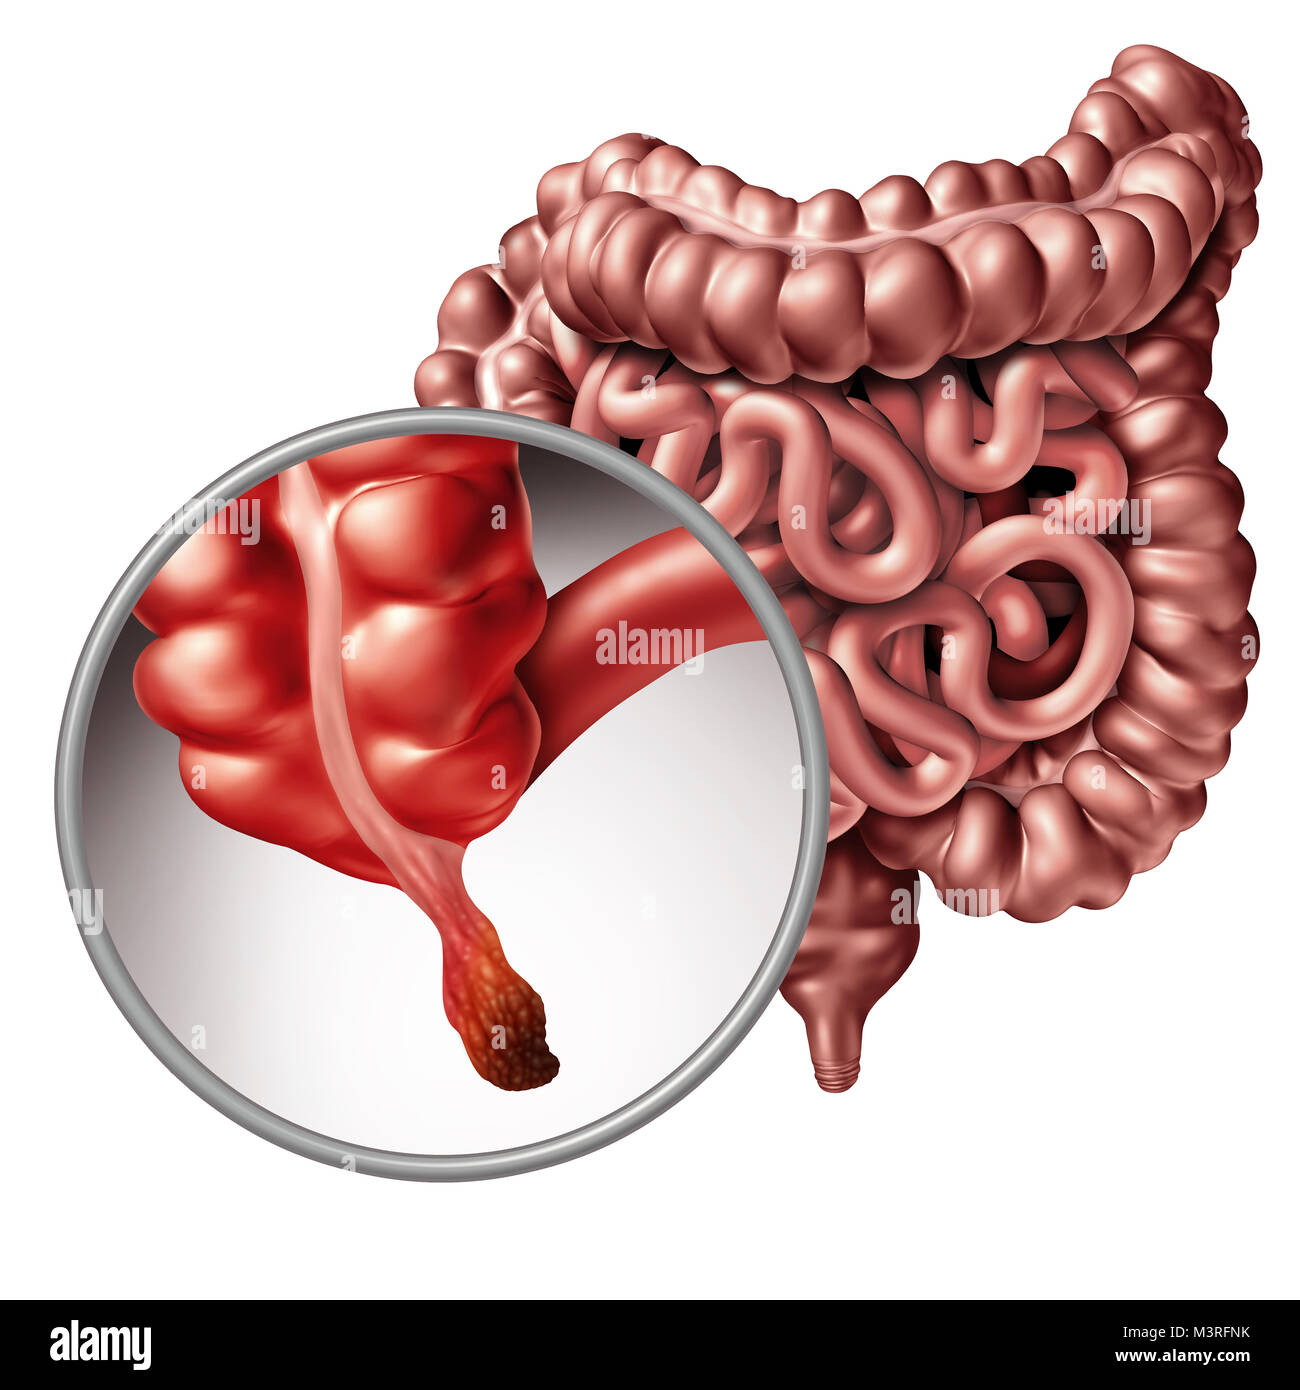 Appendicitis And Appendix Inflammation Disease Concept As A Close Up